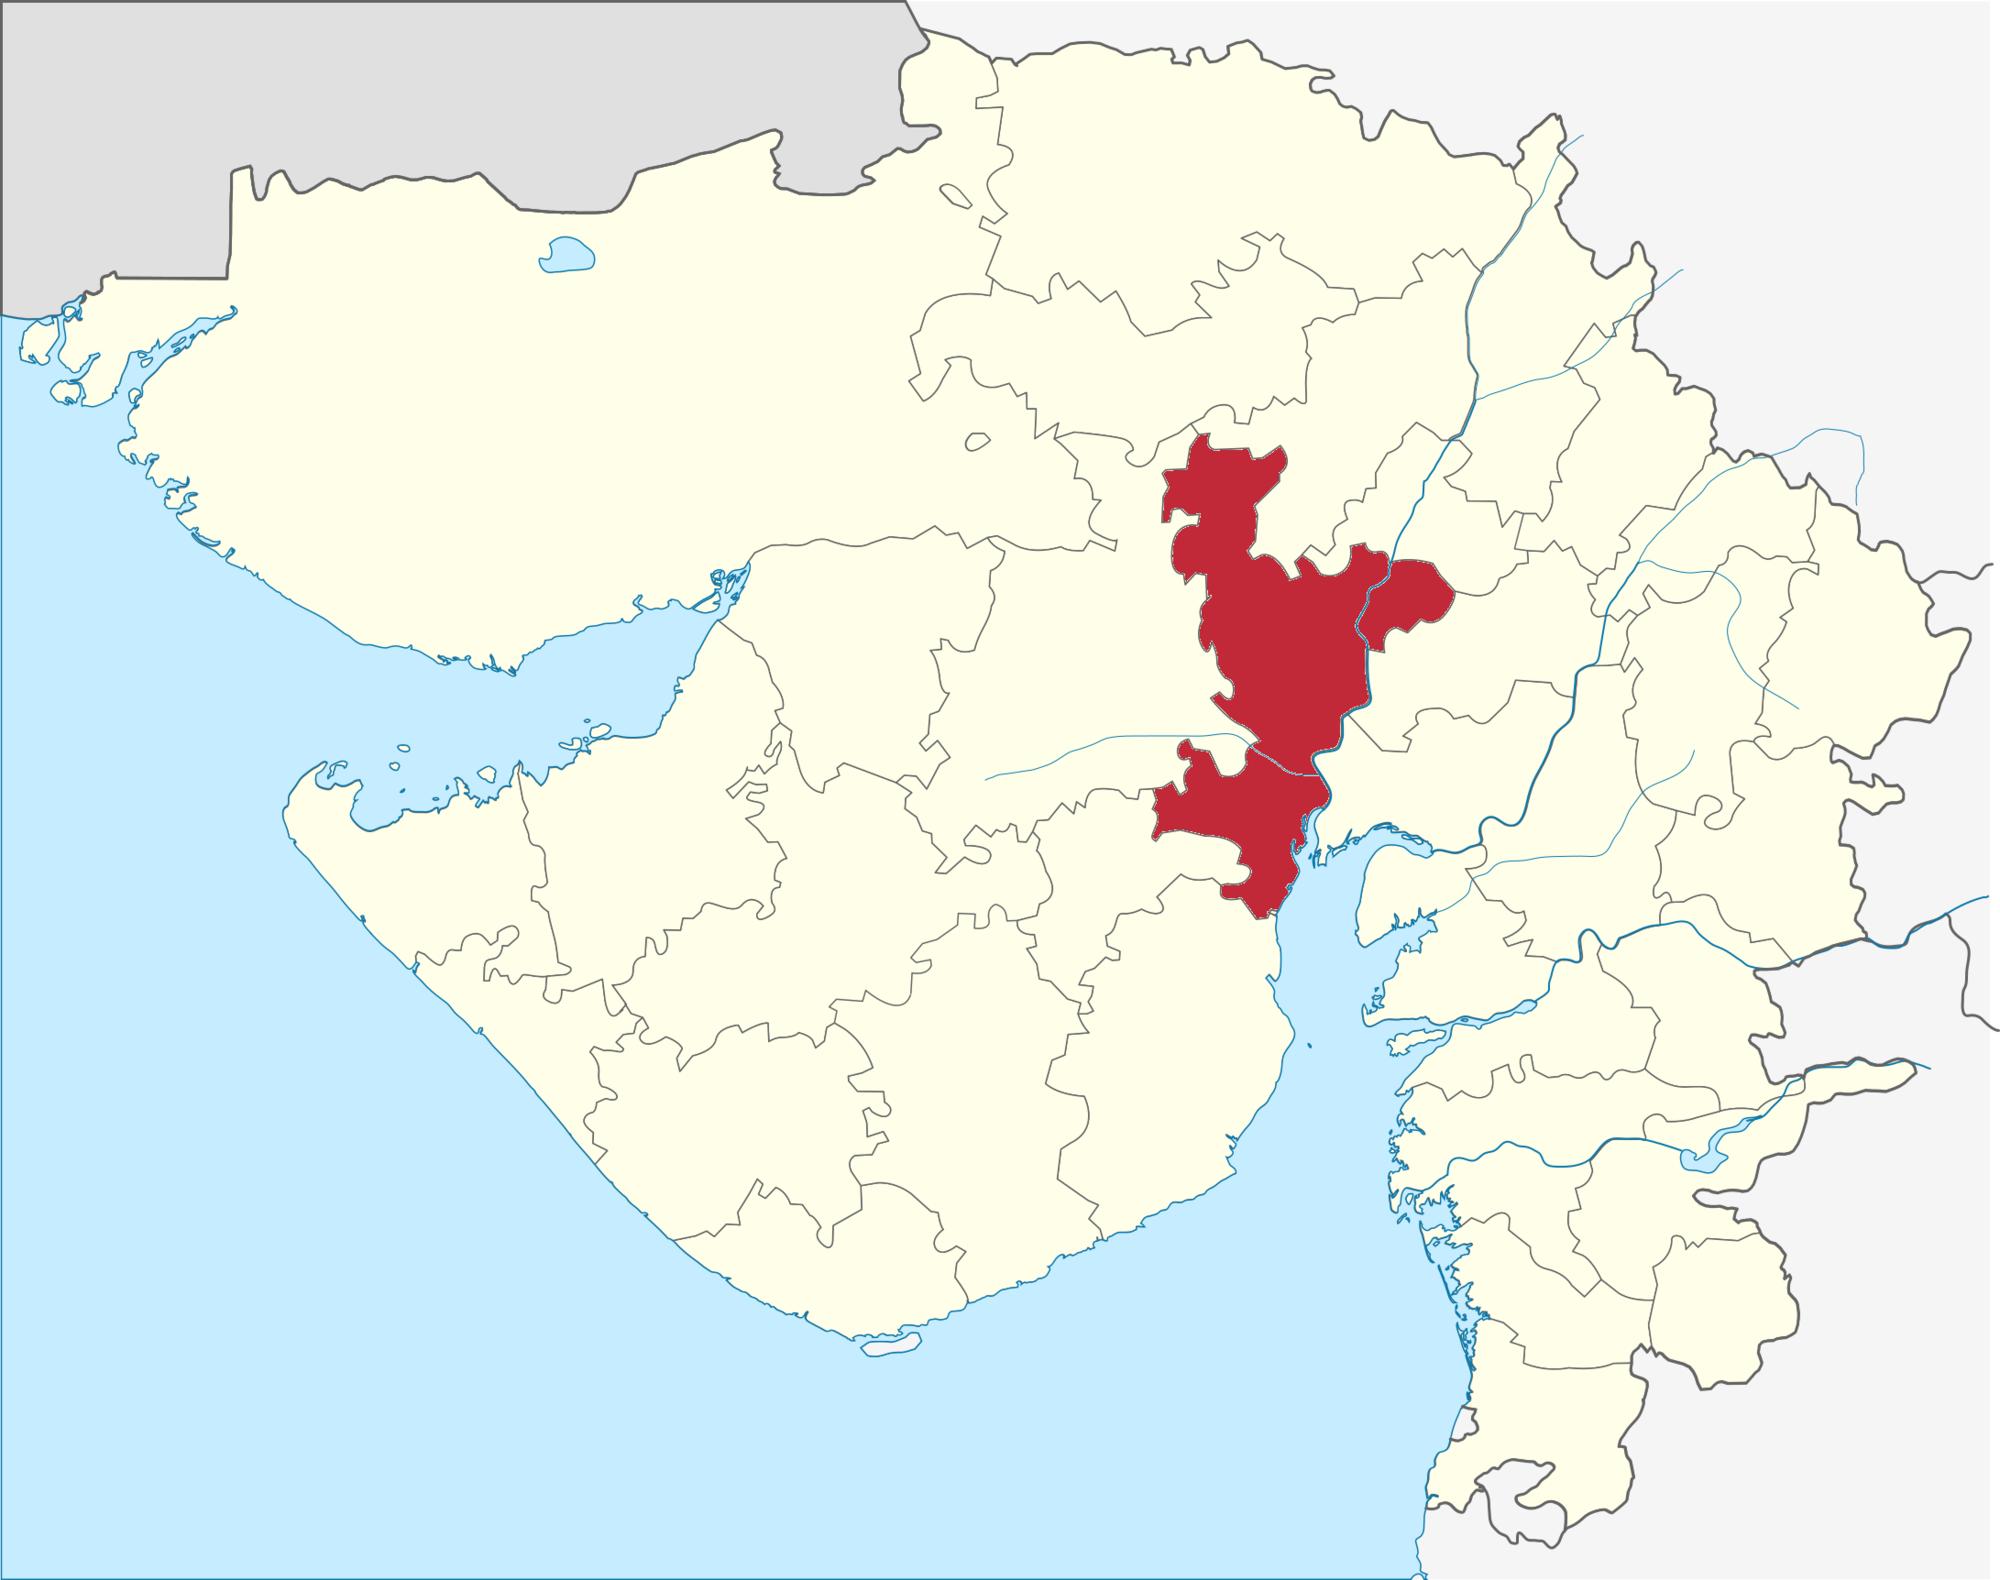 بخش احمدآباد (هند)